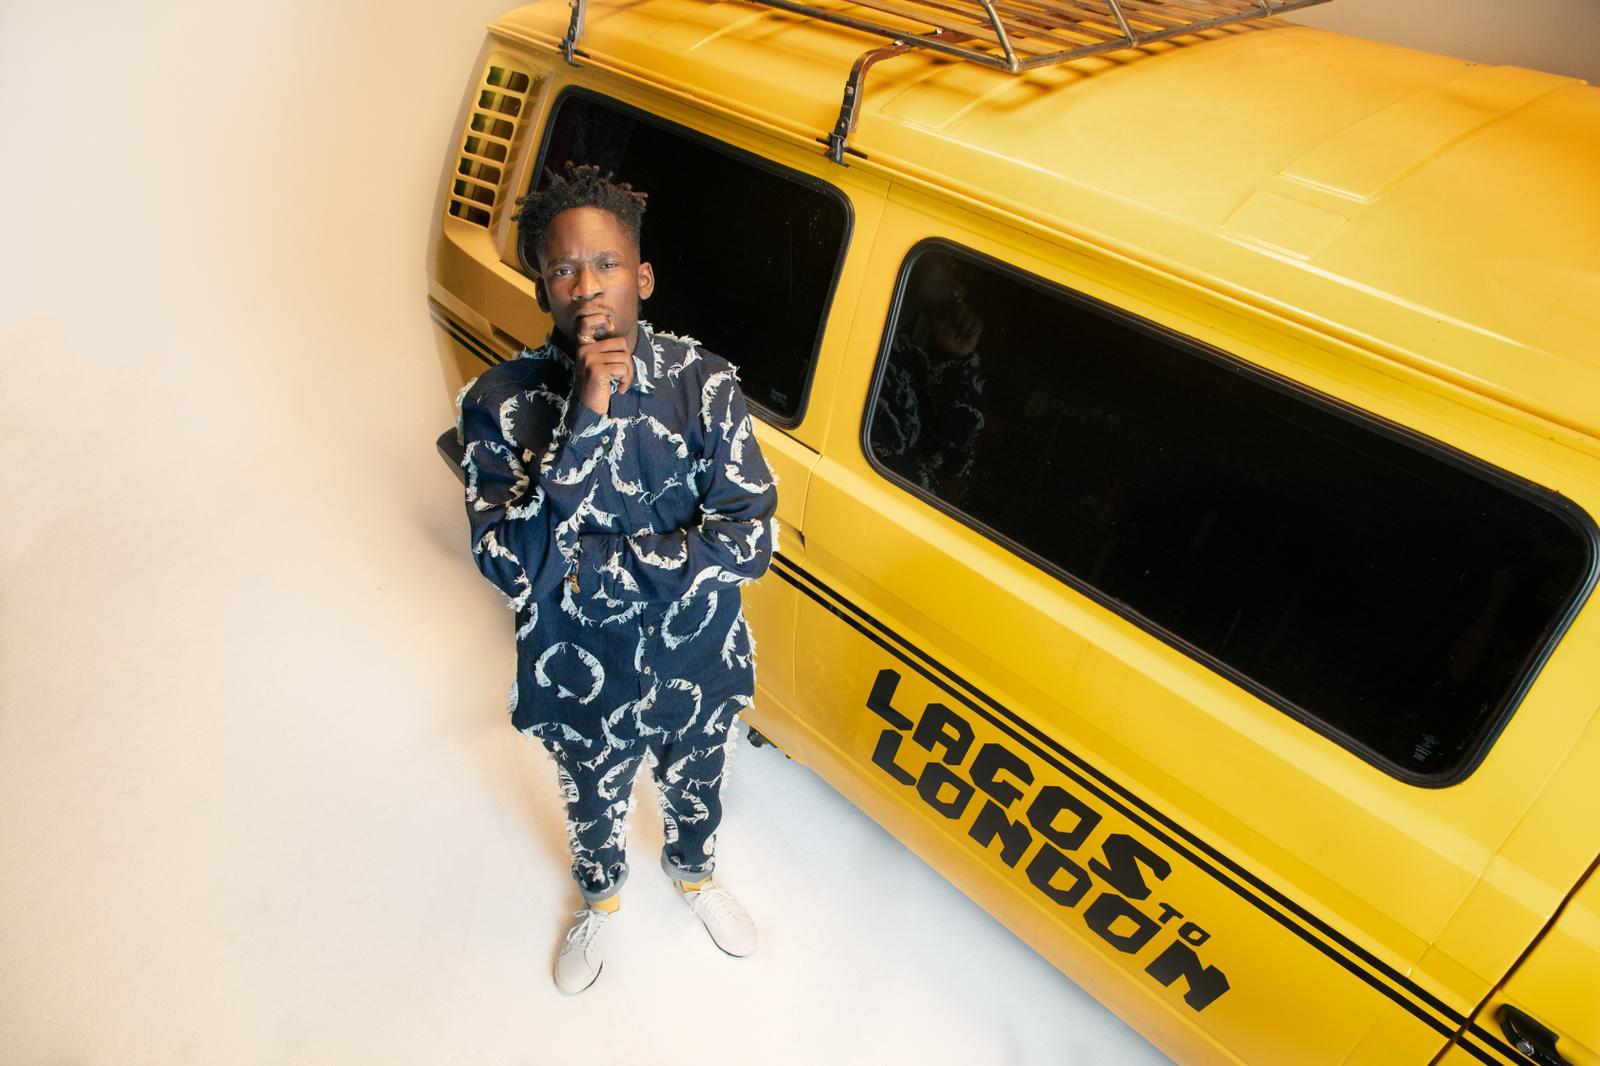 Mr Eazi - Lagos To London - Press Shot (3).JPG